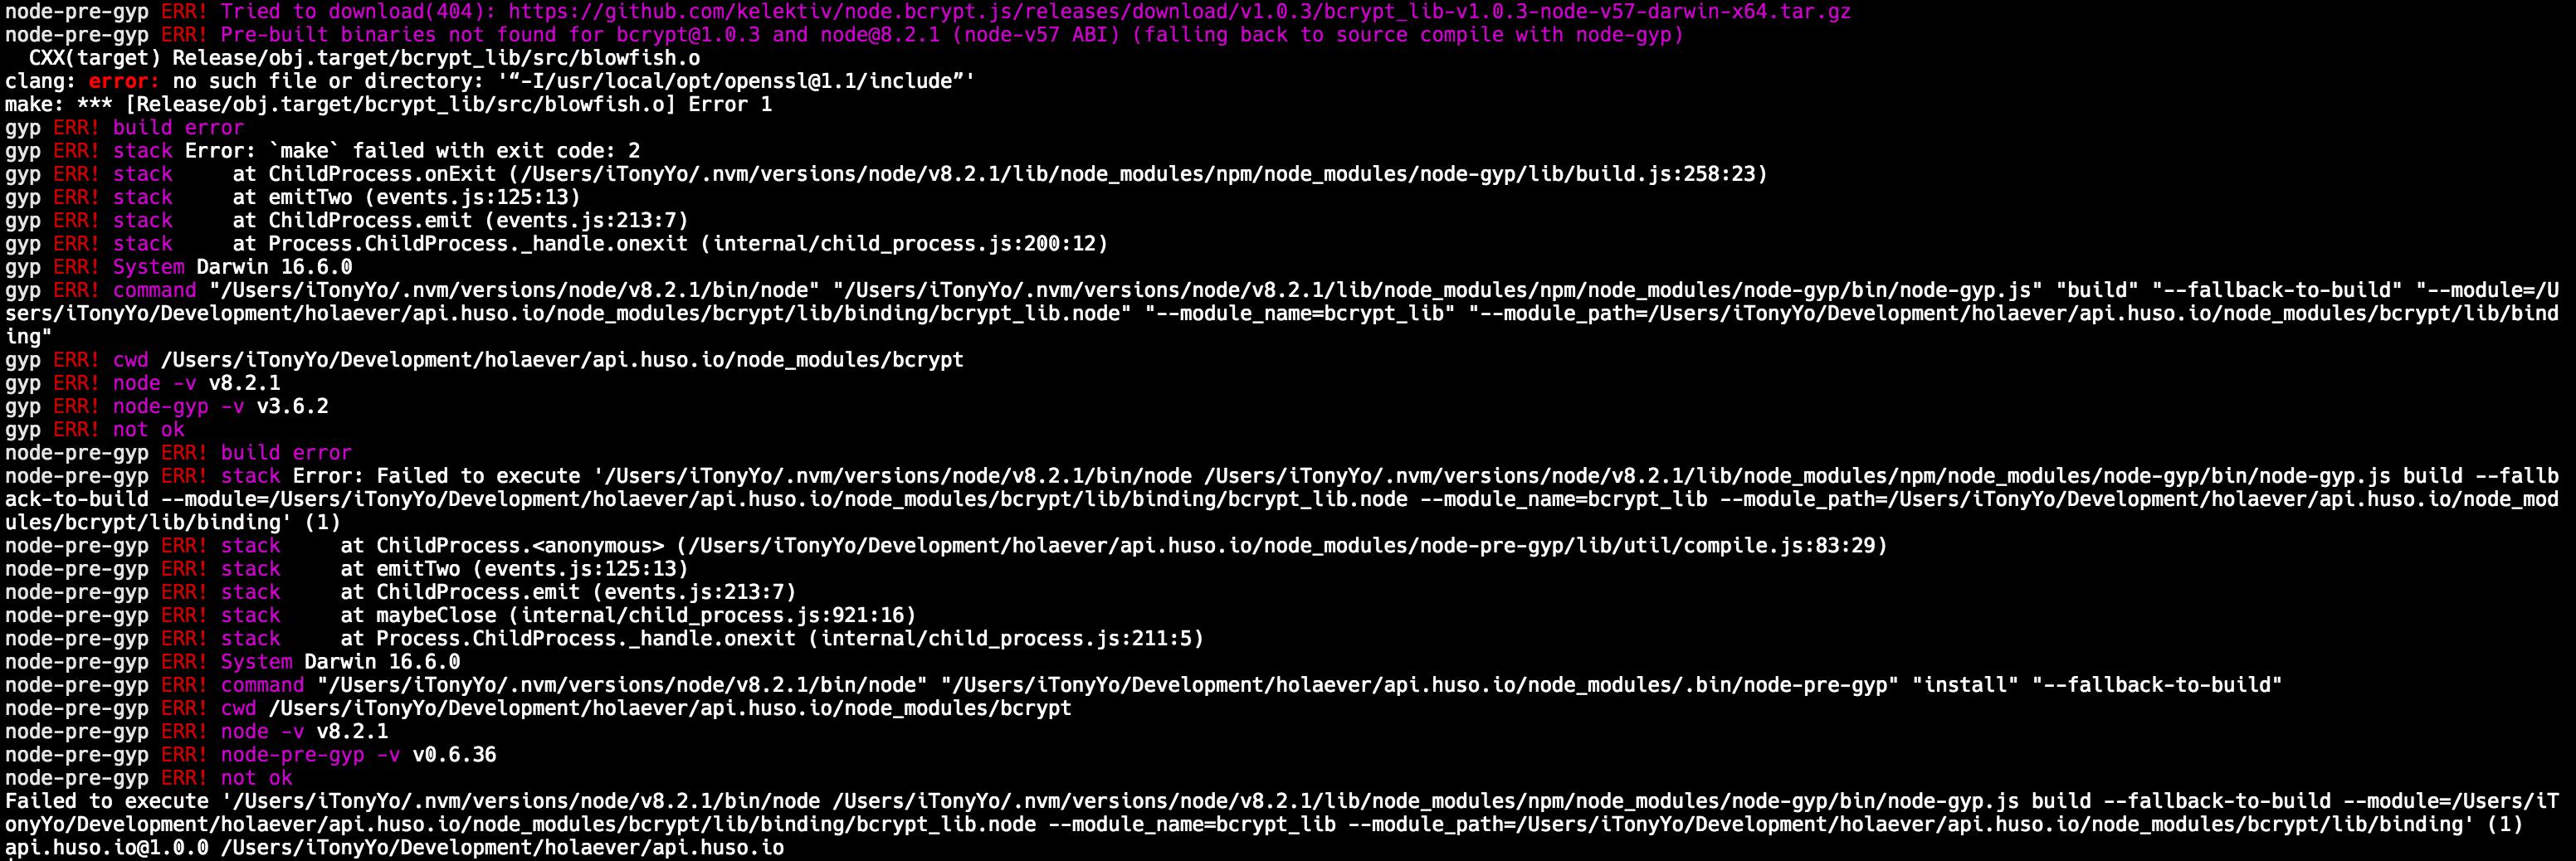 how to install nodejs on ubuntu 16.04 from tar.gz